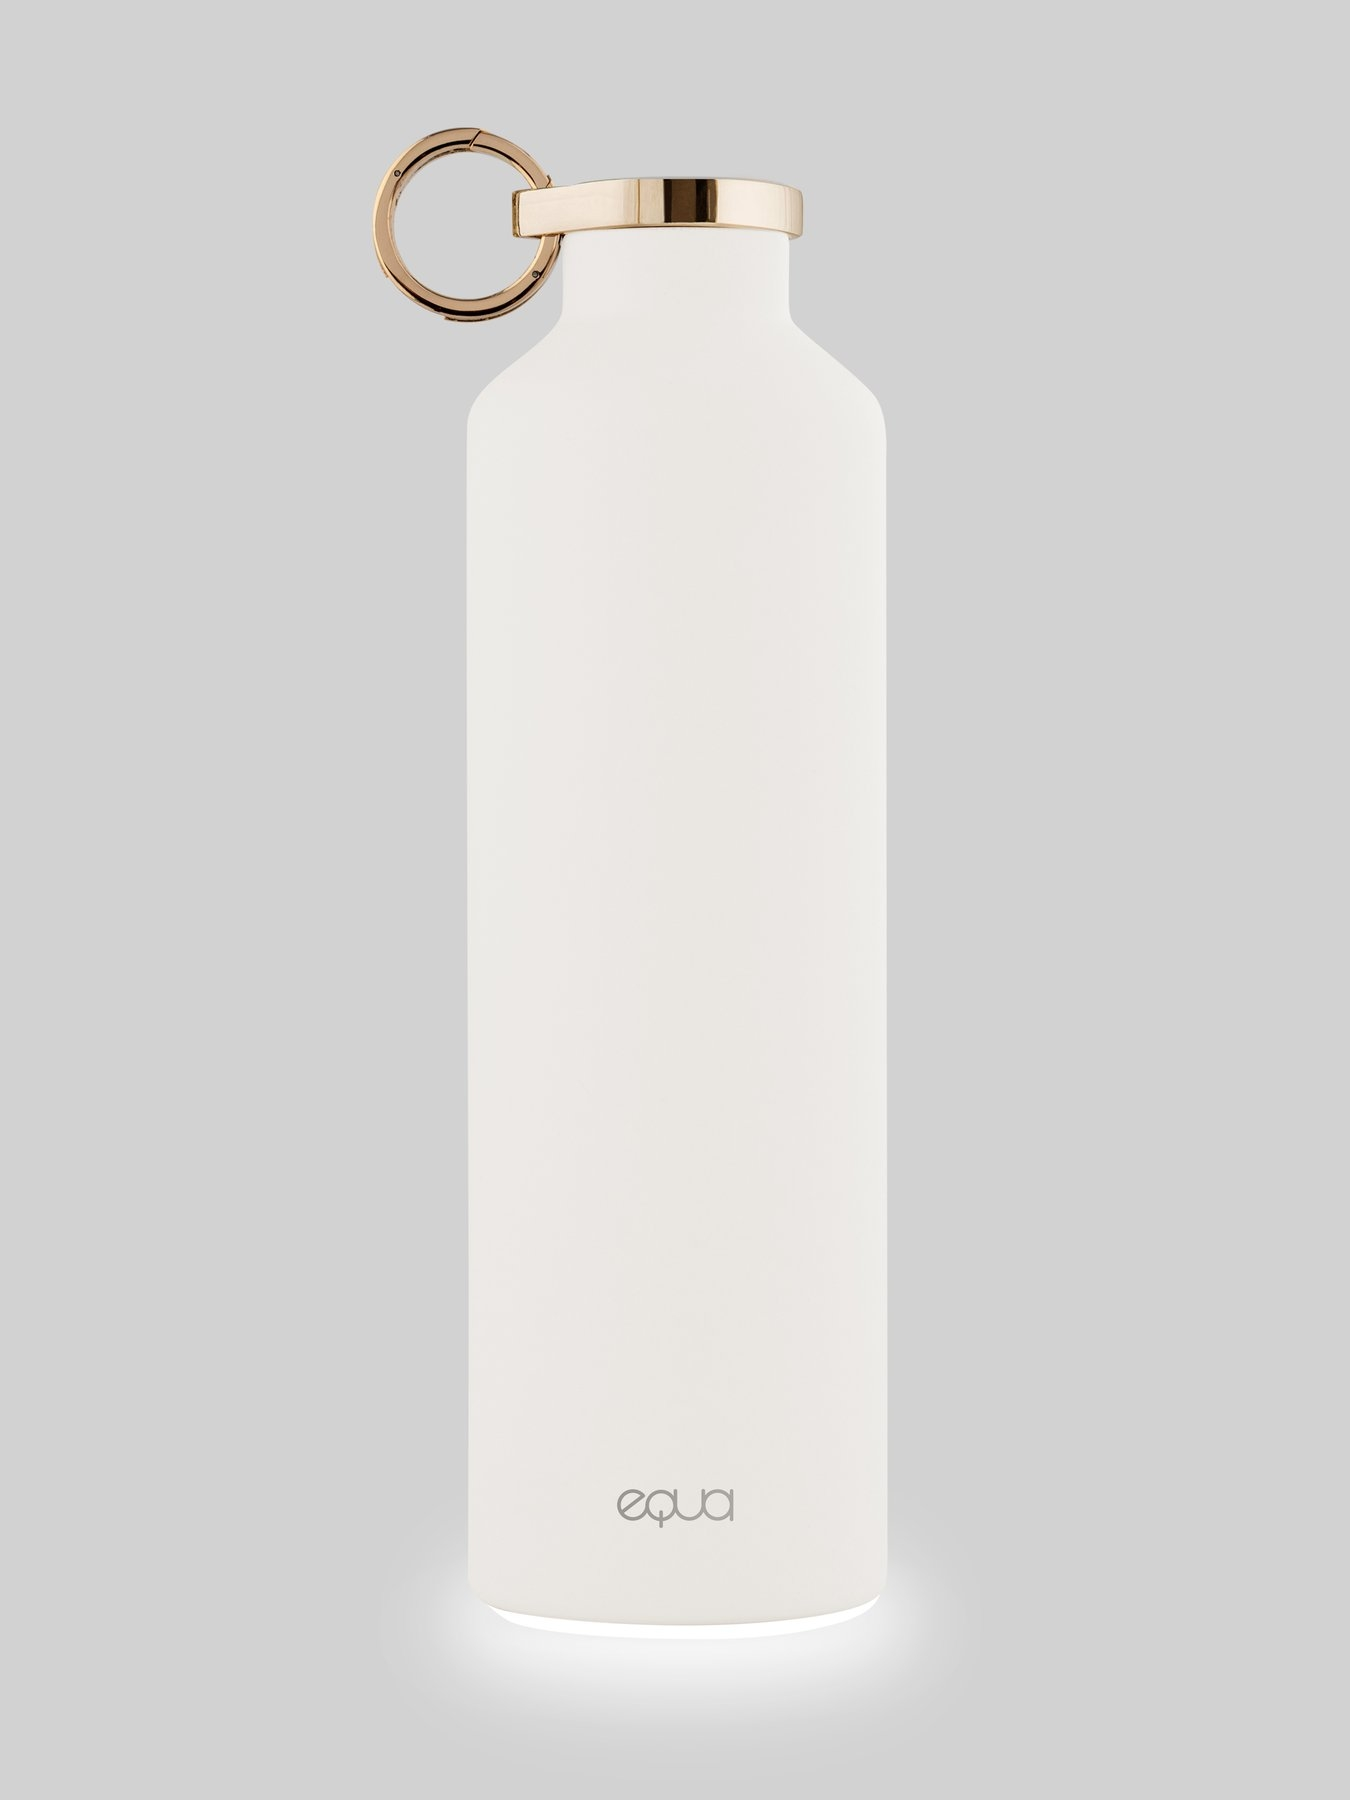 Sticla pentru apa Equa Smart Alb- 680 ml imagine